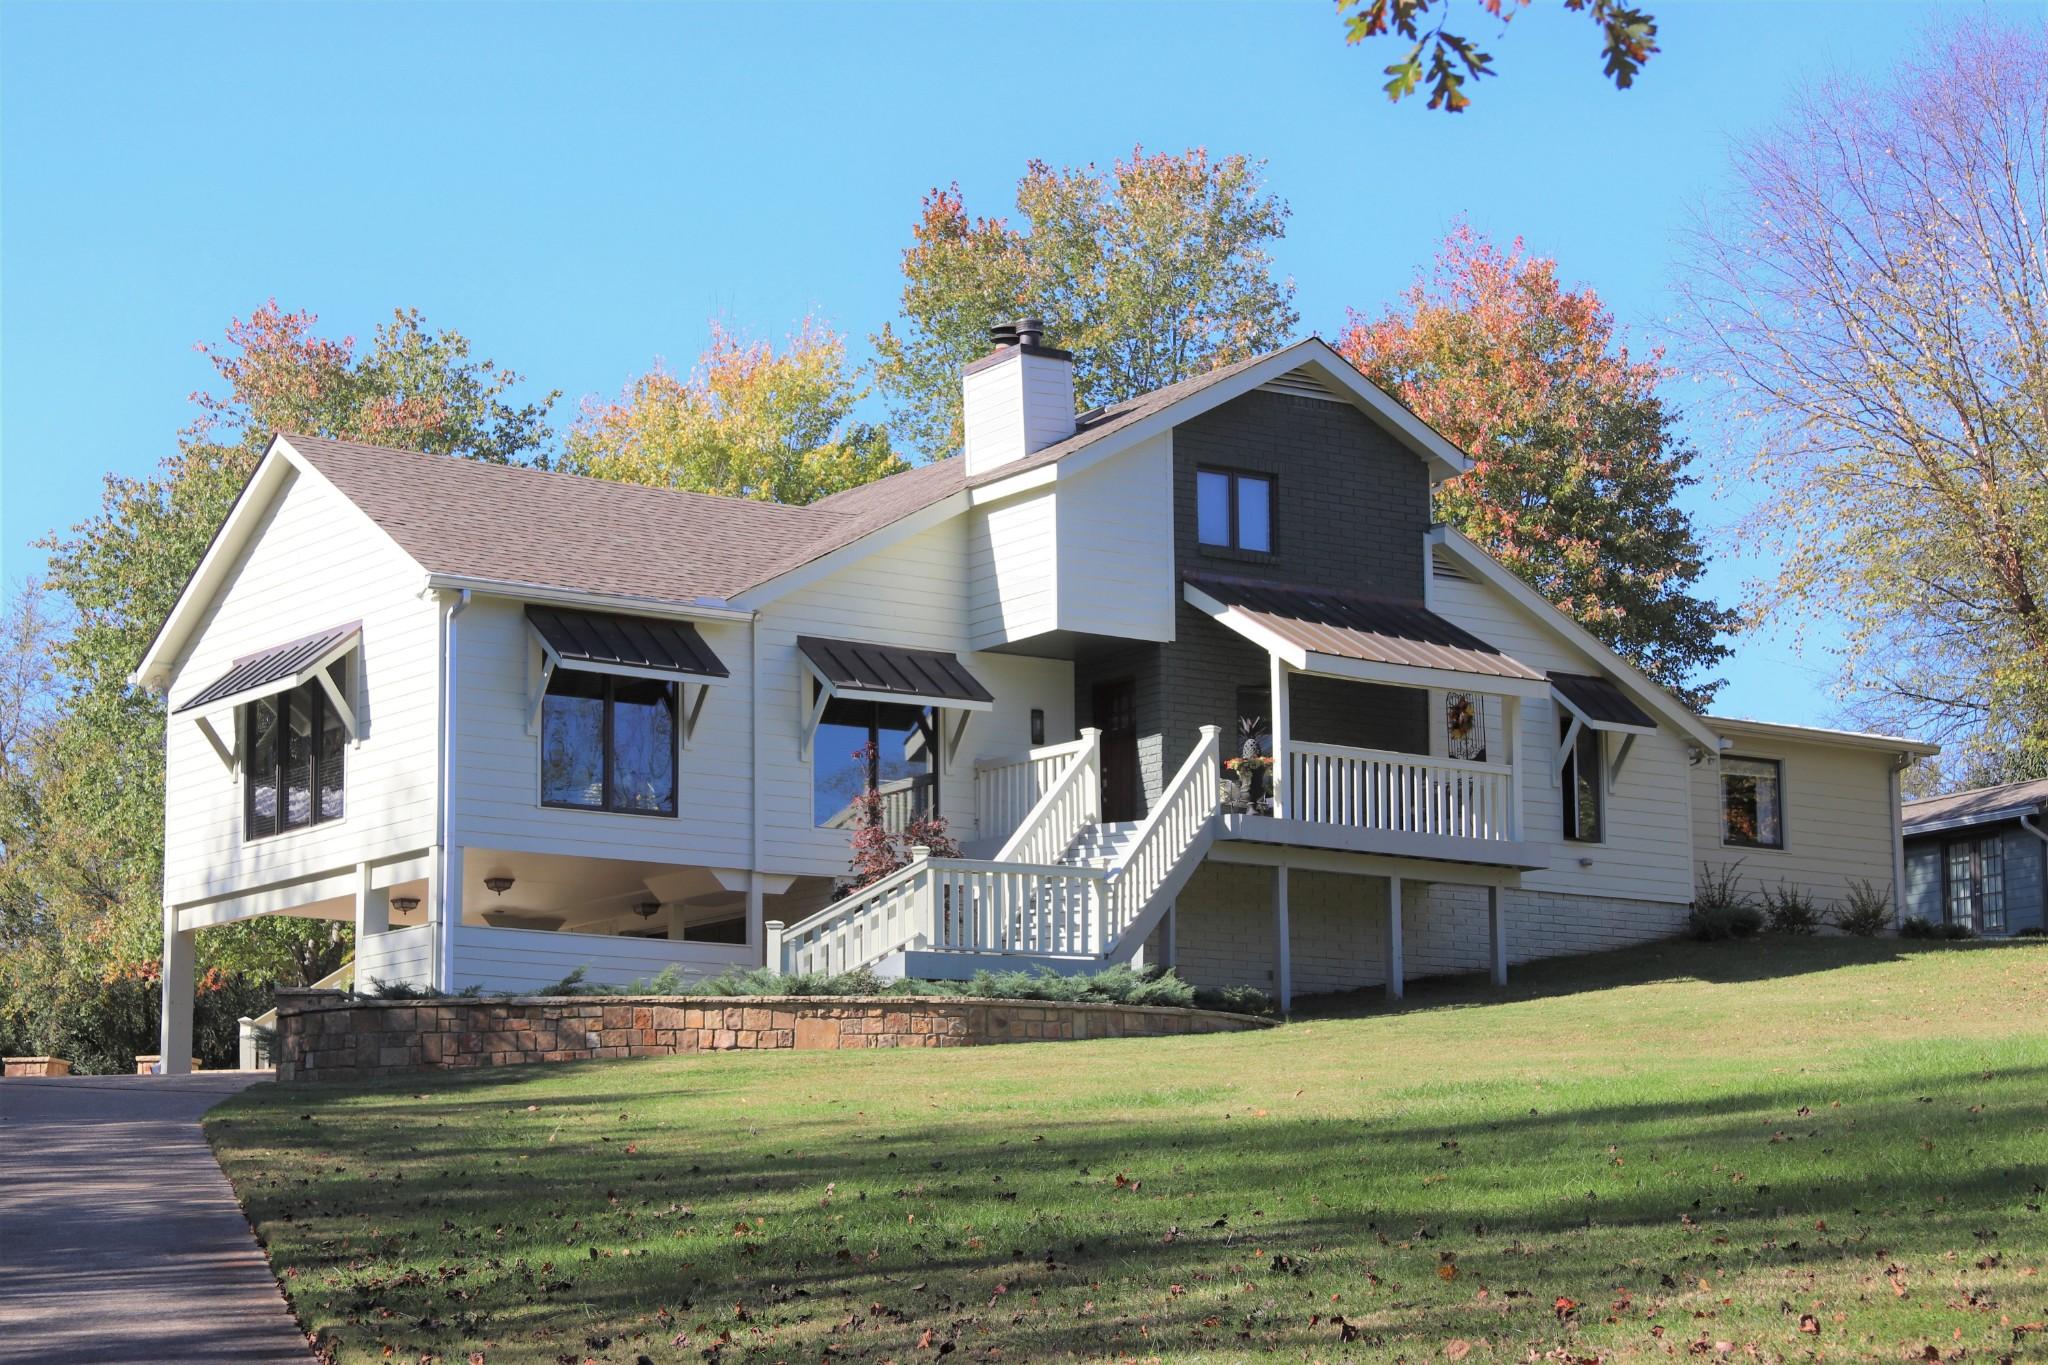 3759 Saundersville Ferry Rd Property Photo - Mount Juliet, TN real estate listing